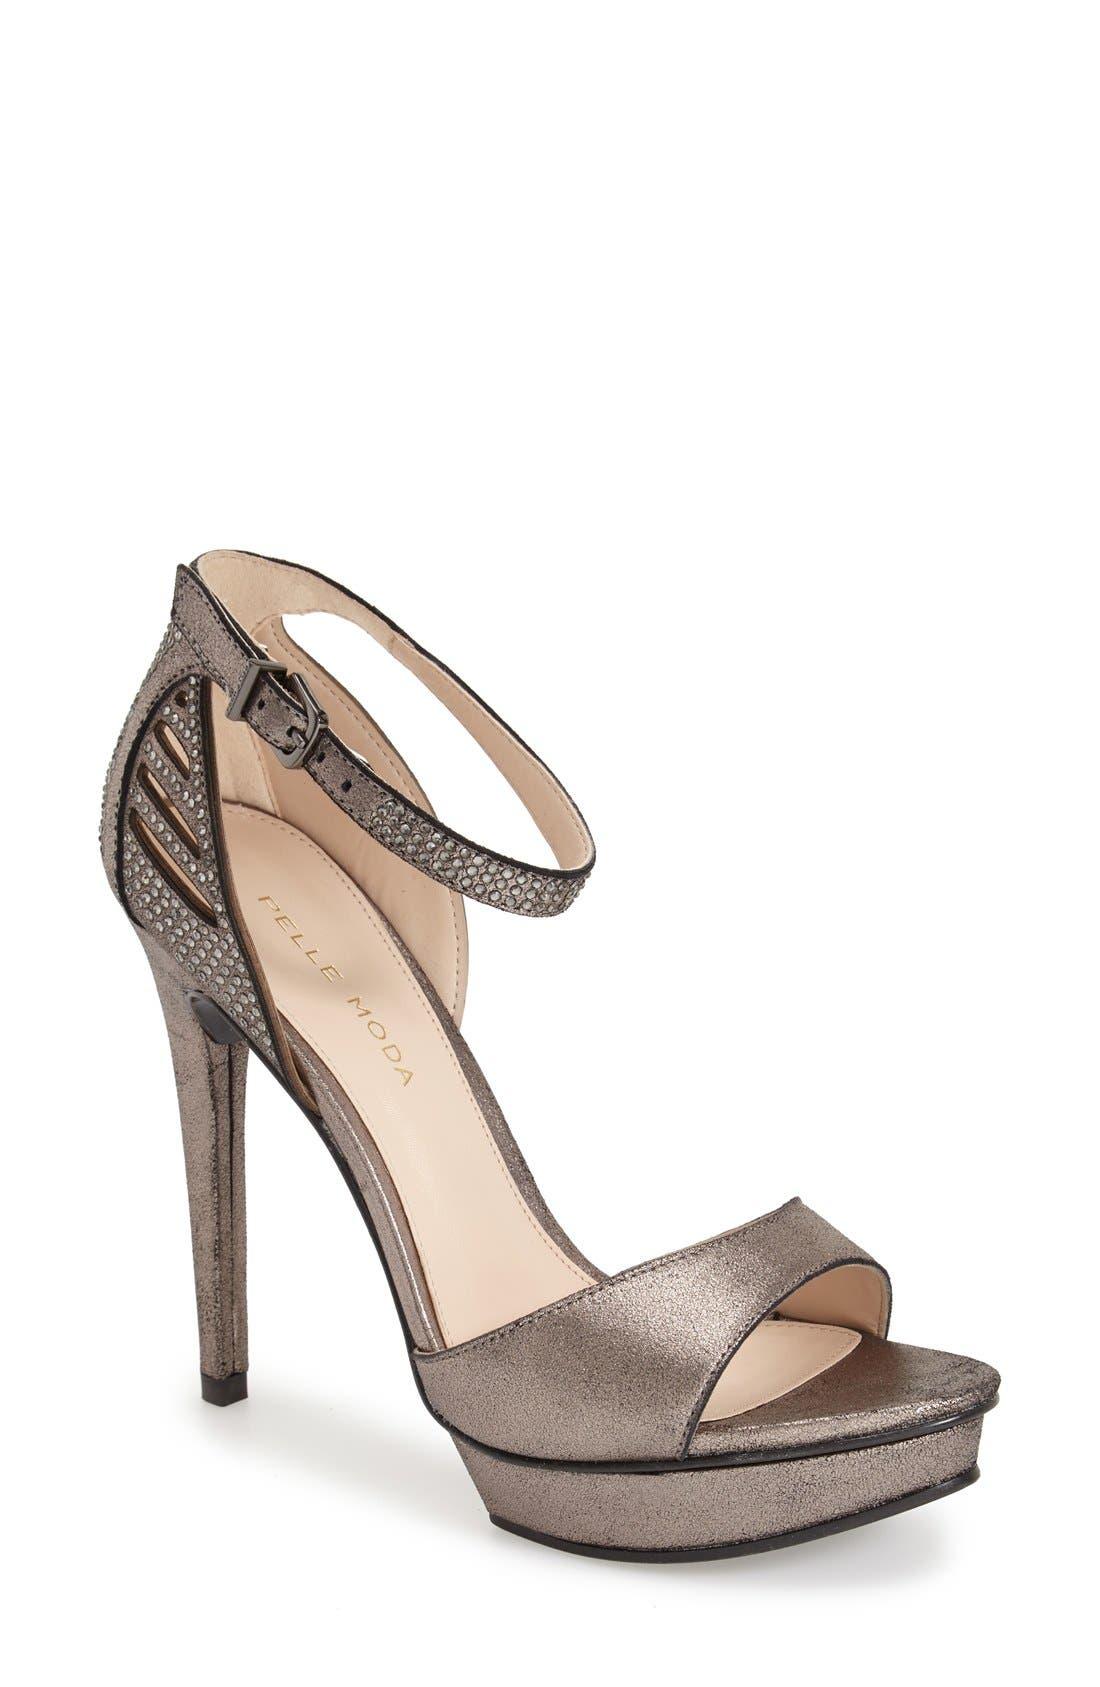 'Fenton' Ankle Strap Sandal,                             Main thumbnail 3, color,